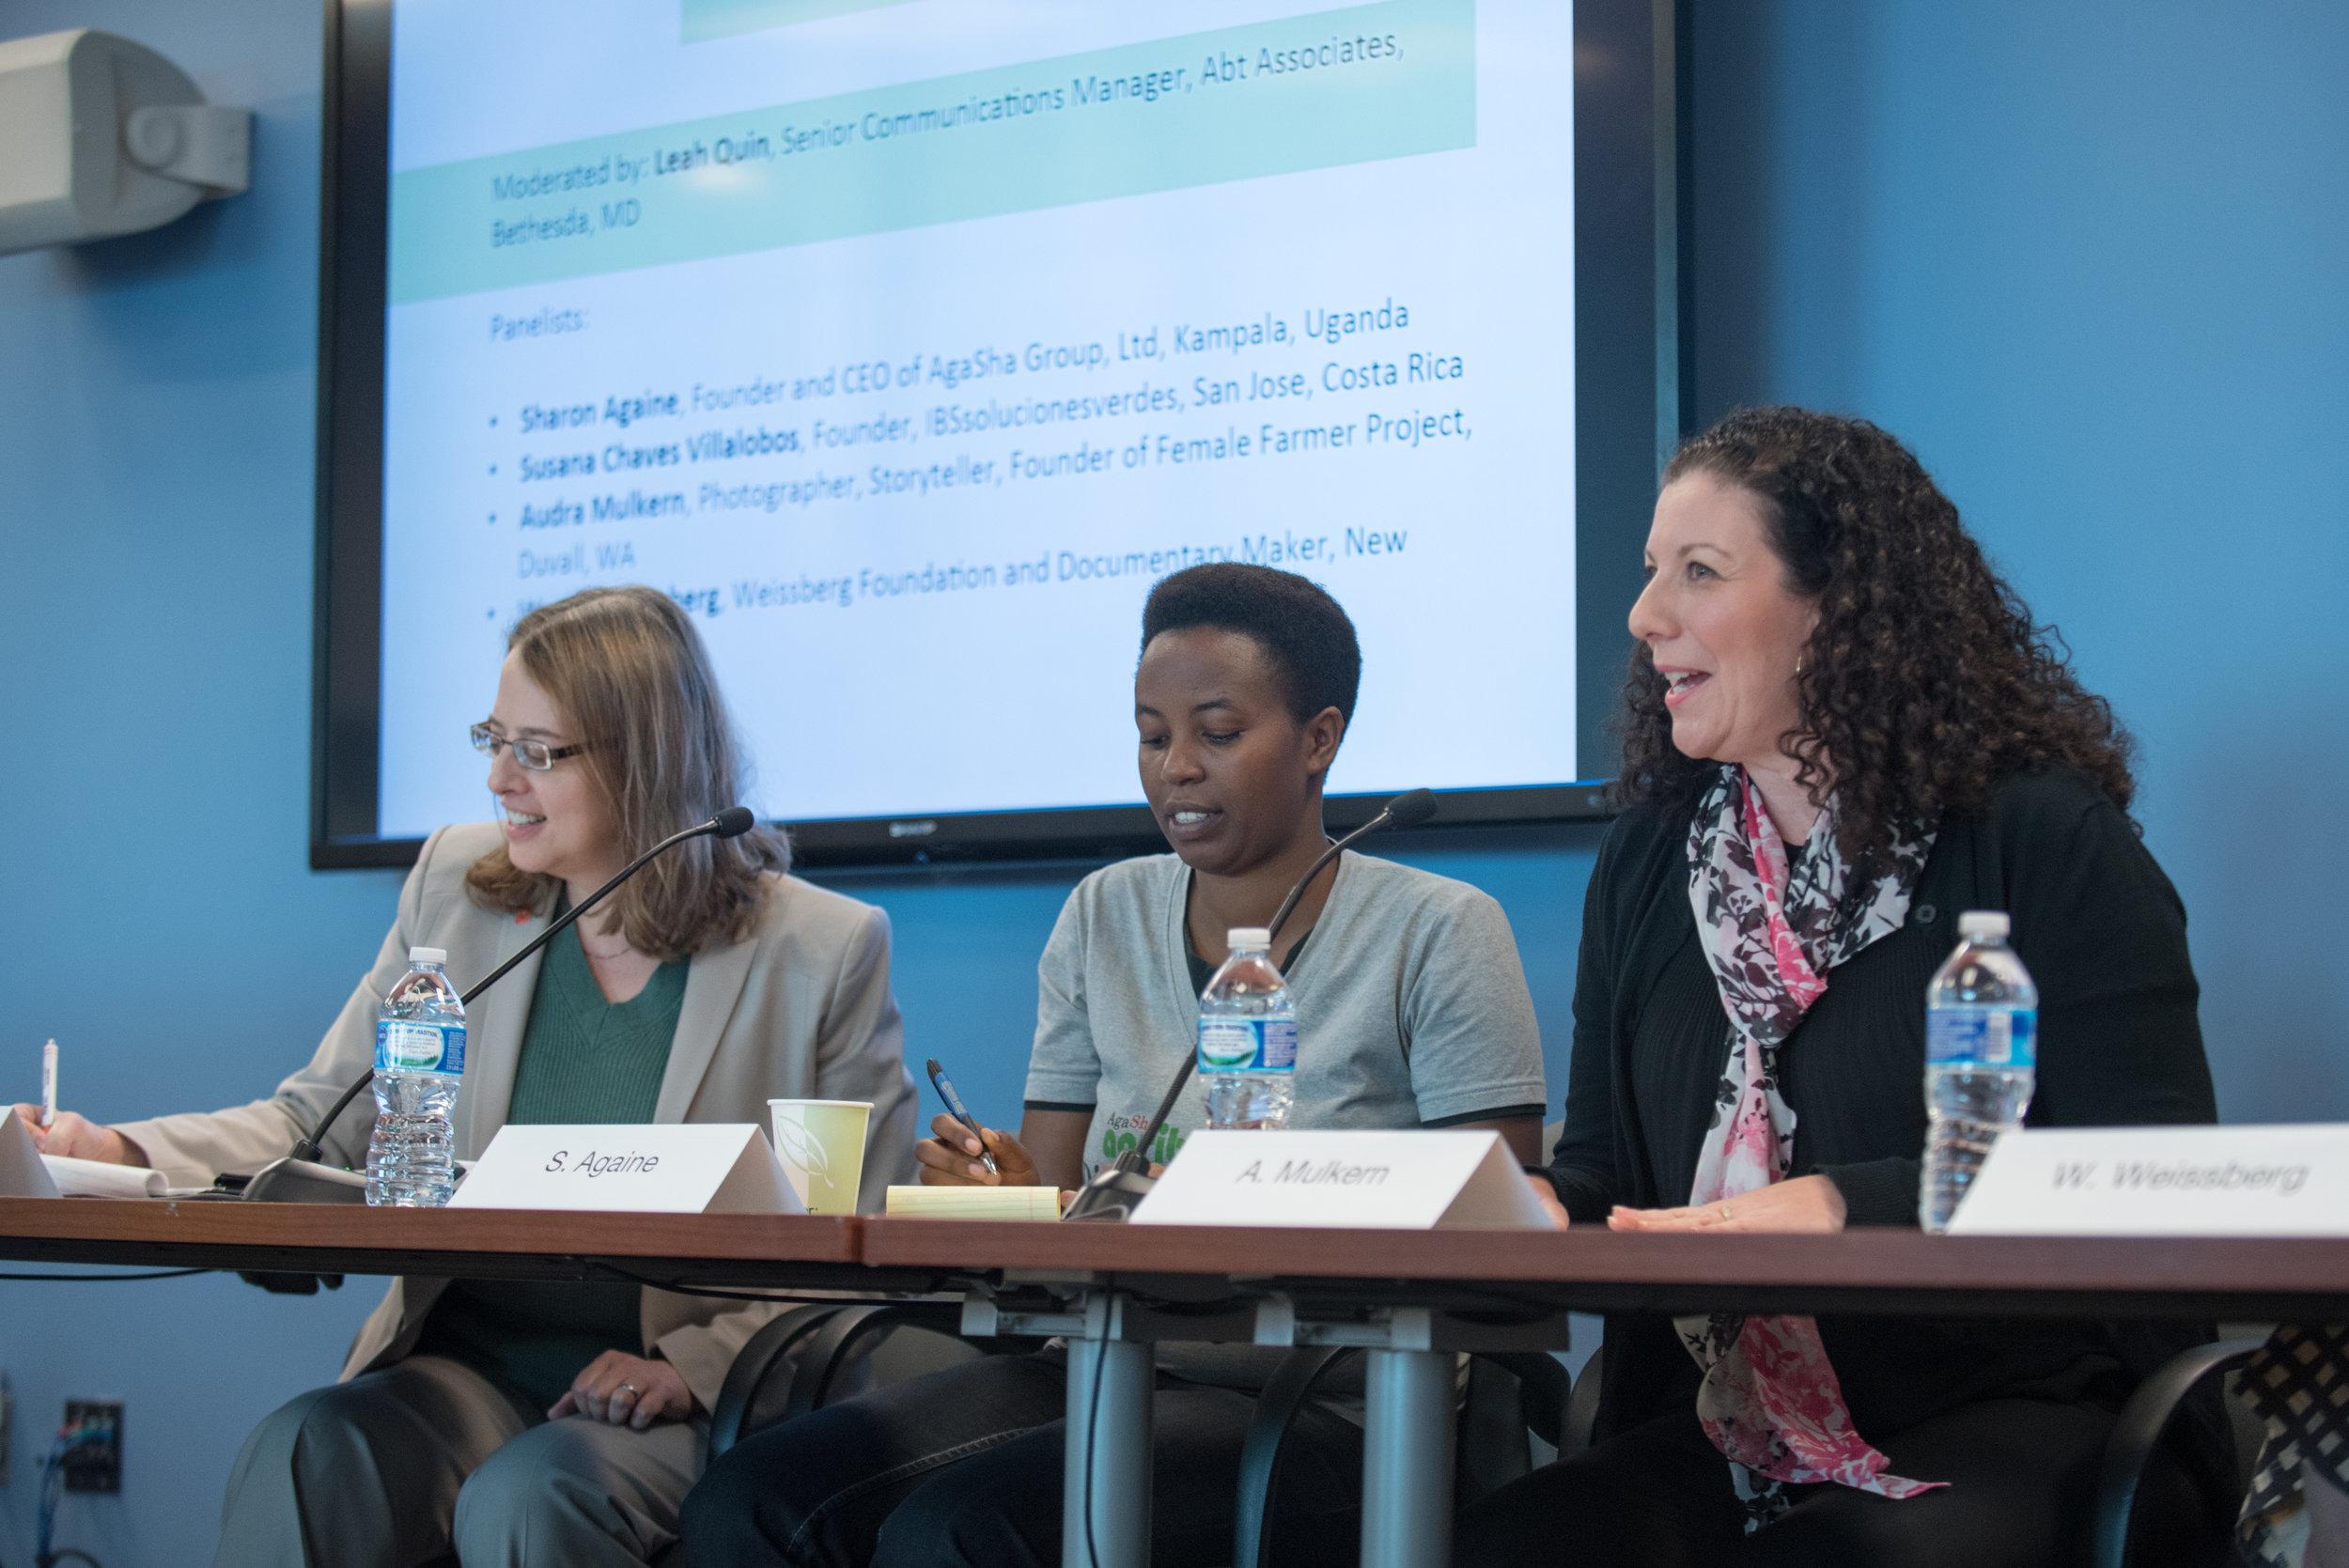 George Washington University, Elliot School of International Affairs, Global Gender Program